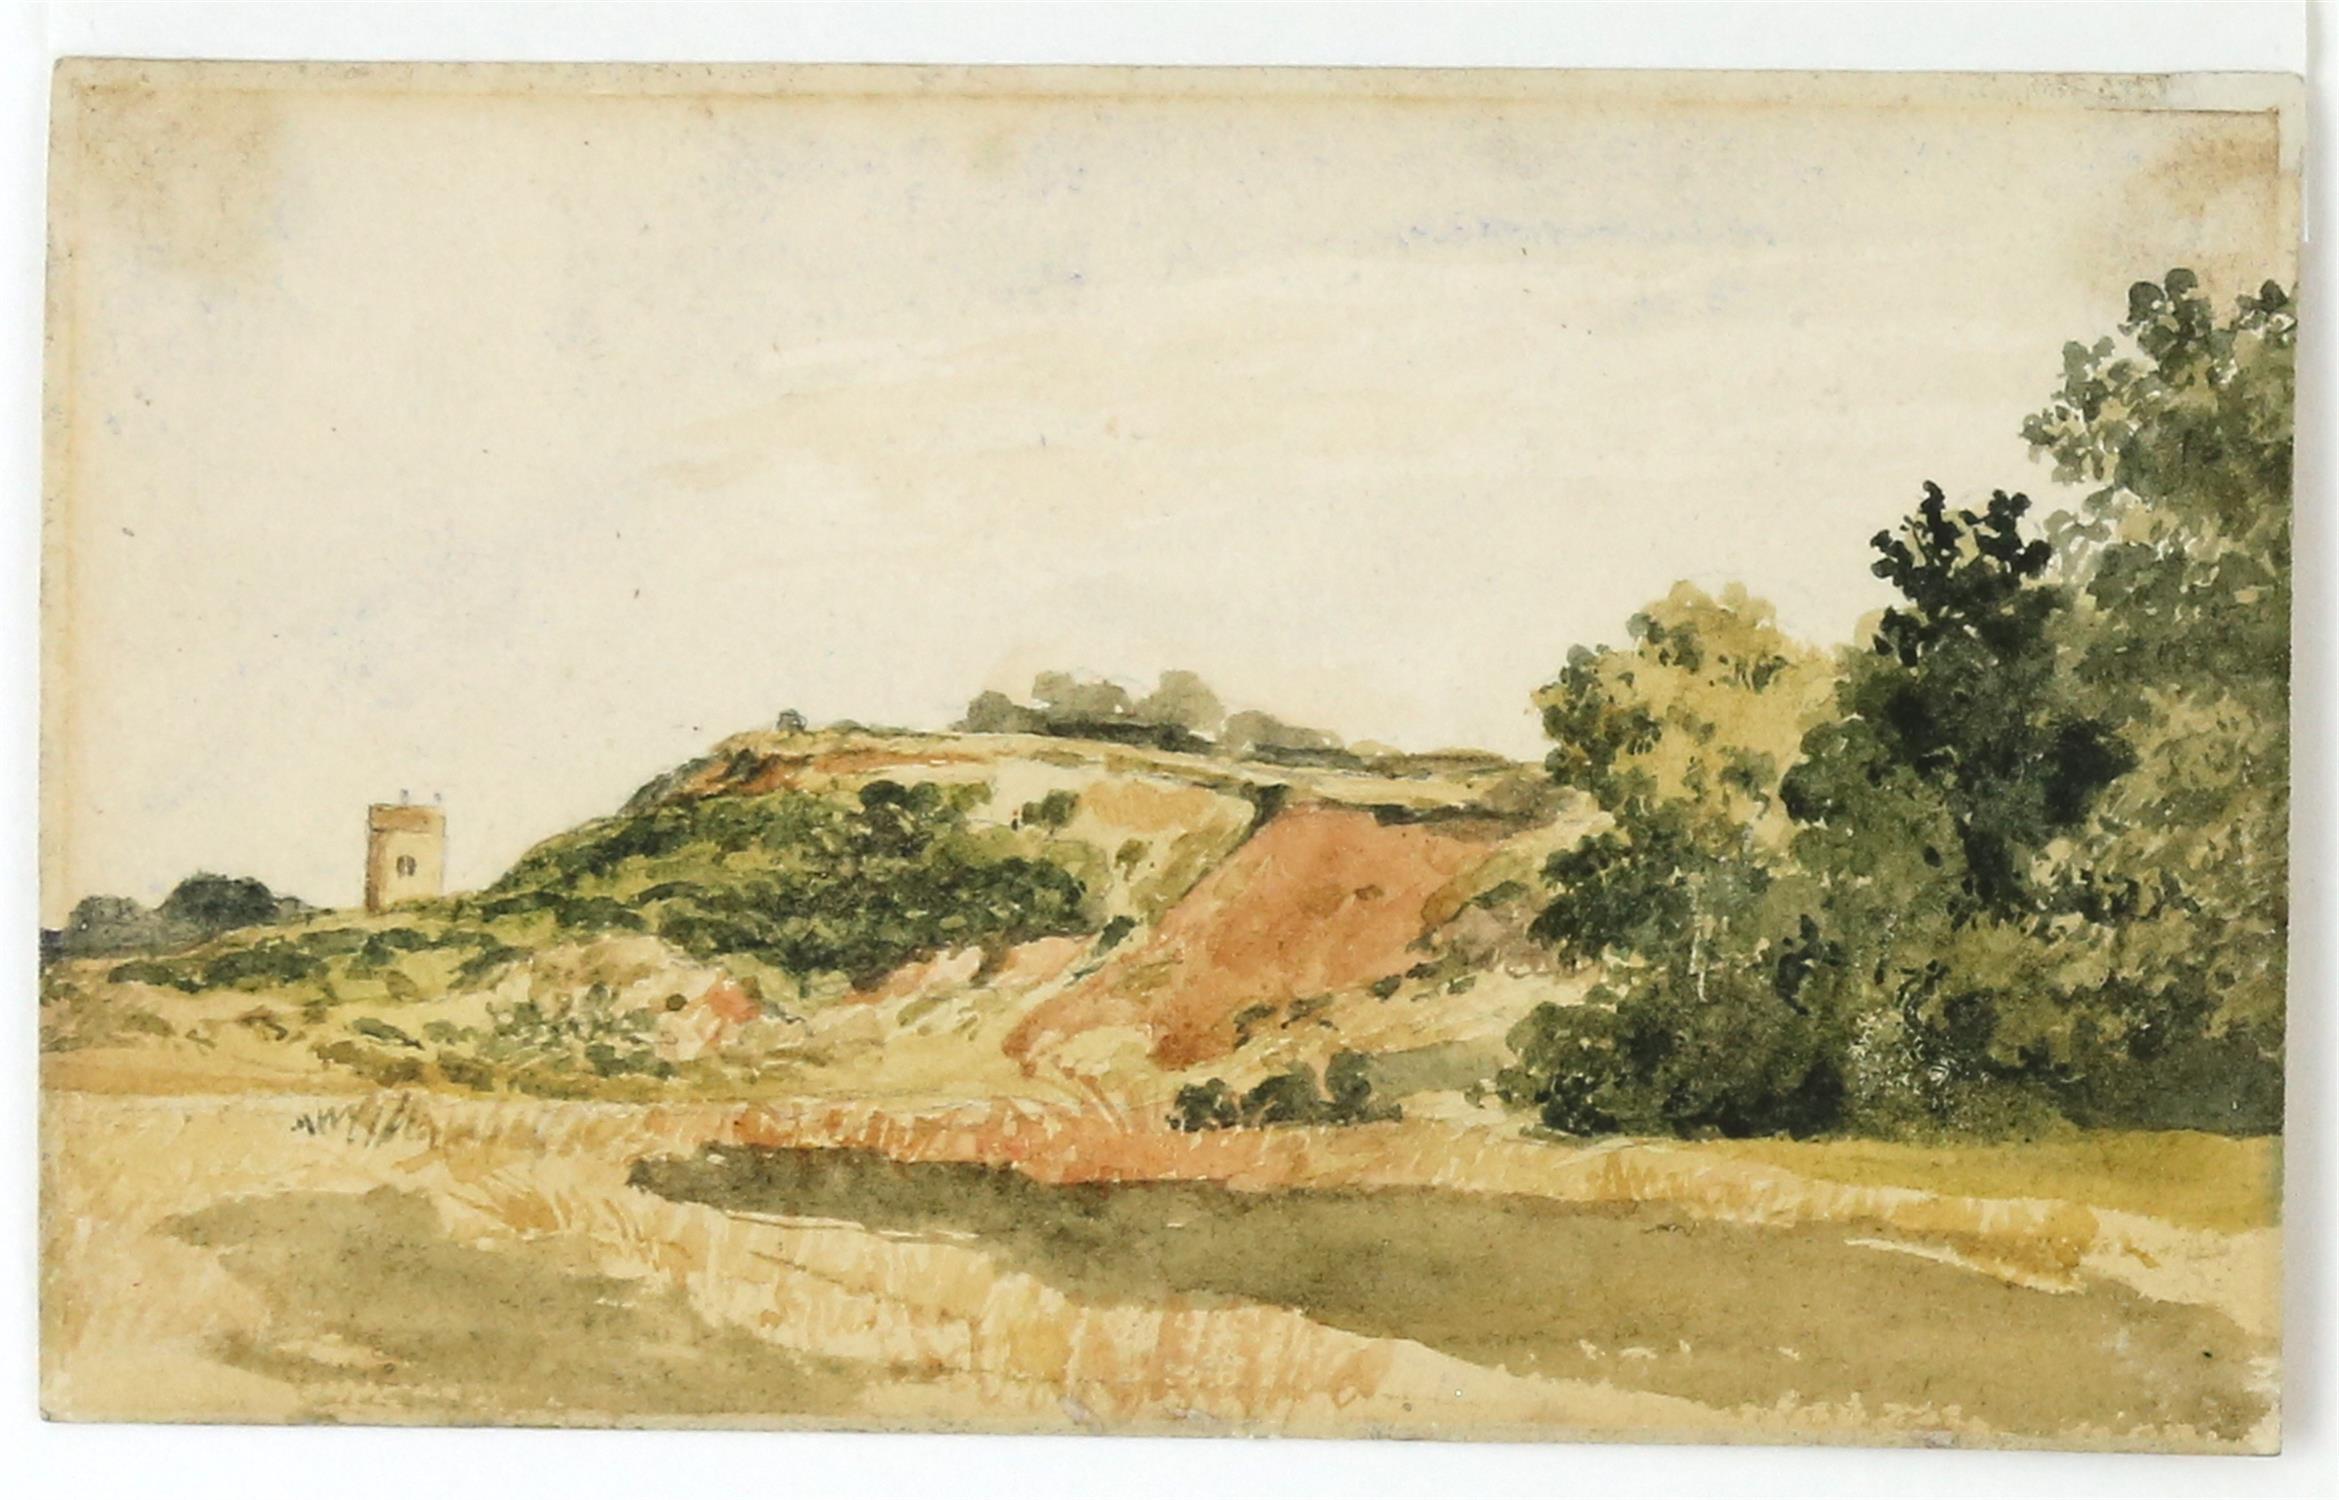 James Stark (British, 1794-1859), 'New Mills, Norwich', 11cm x 8cm, and 'Whitlingham, near Norwich',